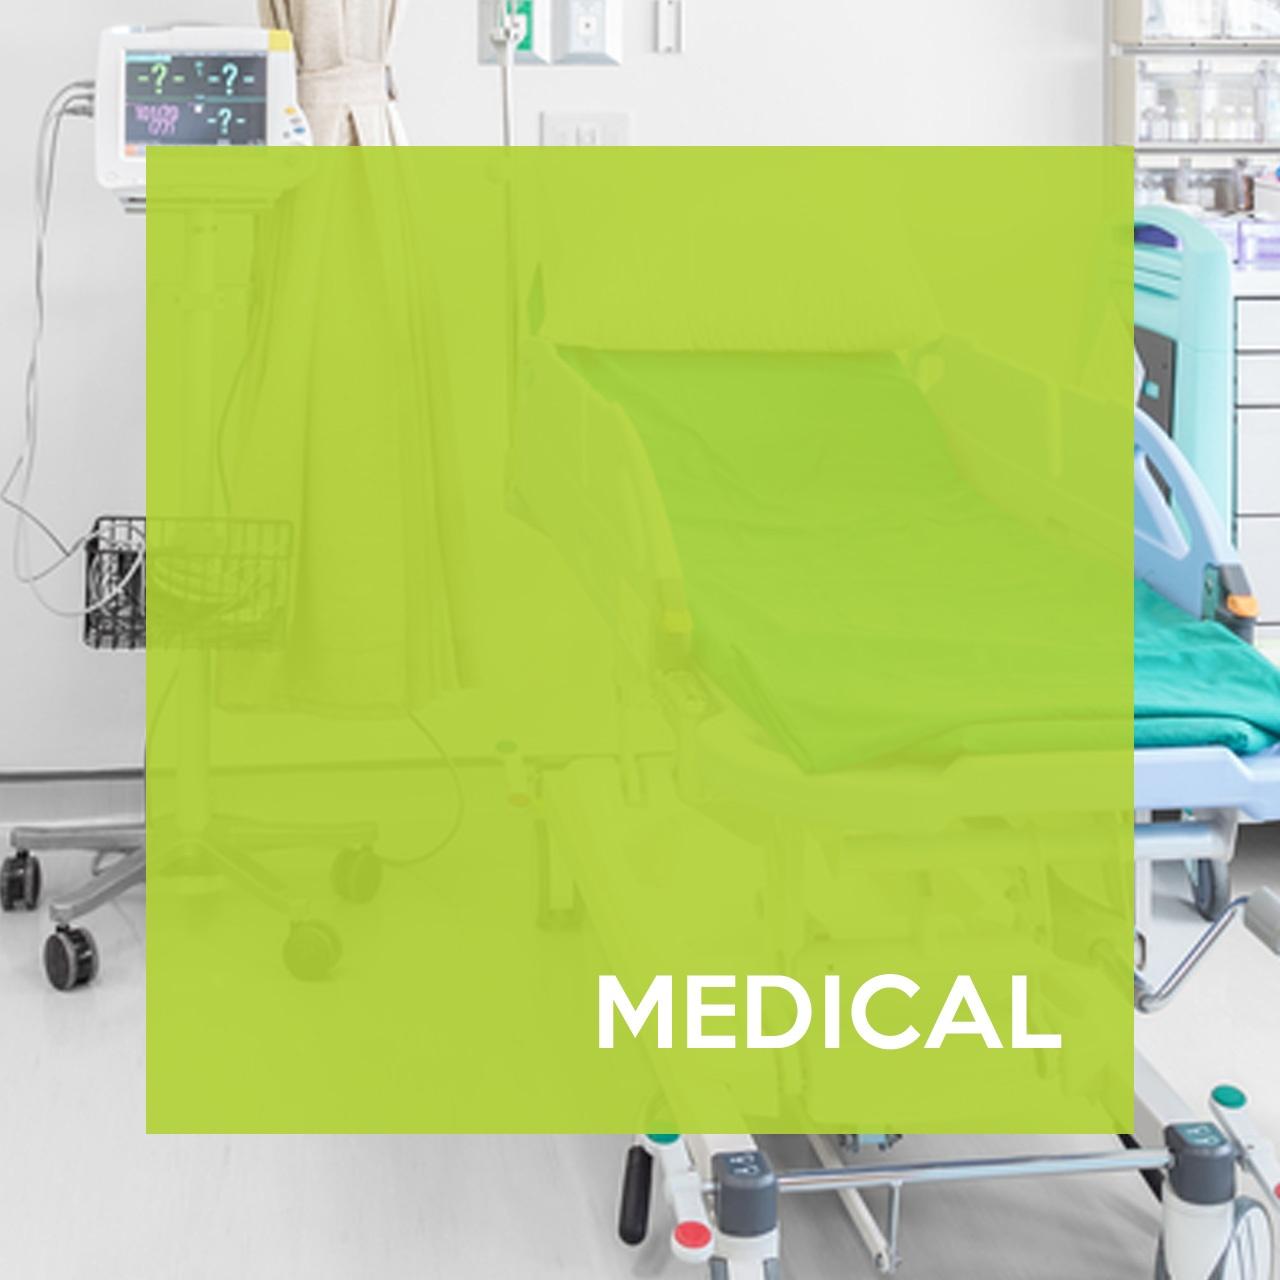 AMI_COMMERCIAL__medical_-_020.jpg